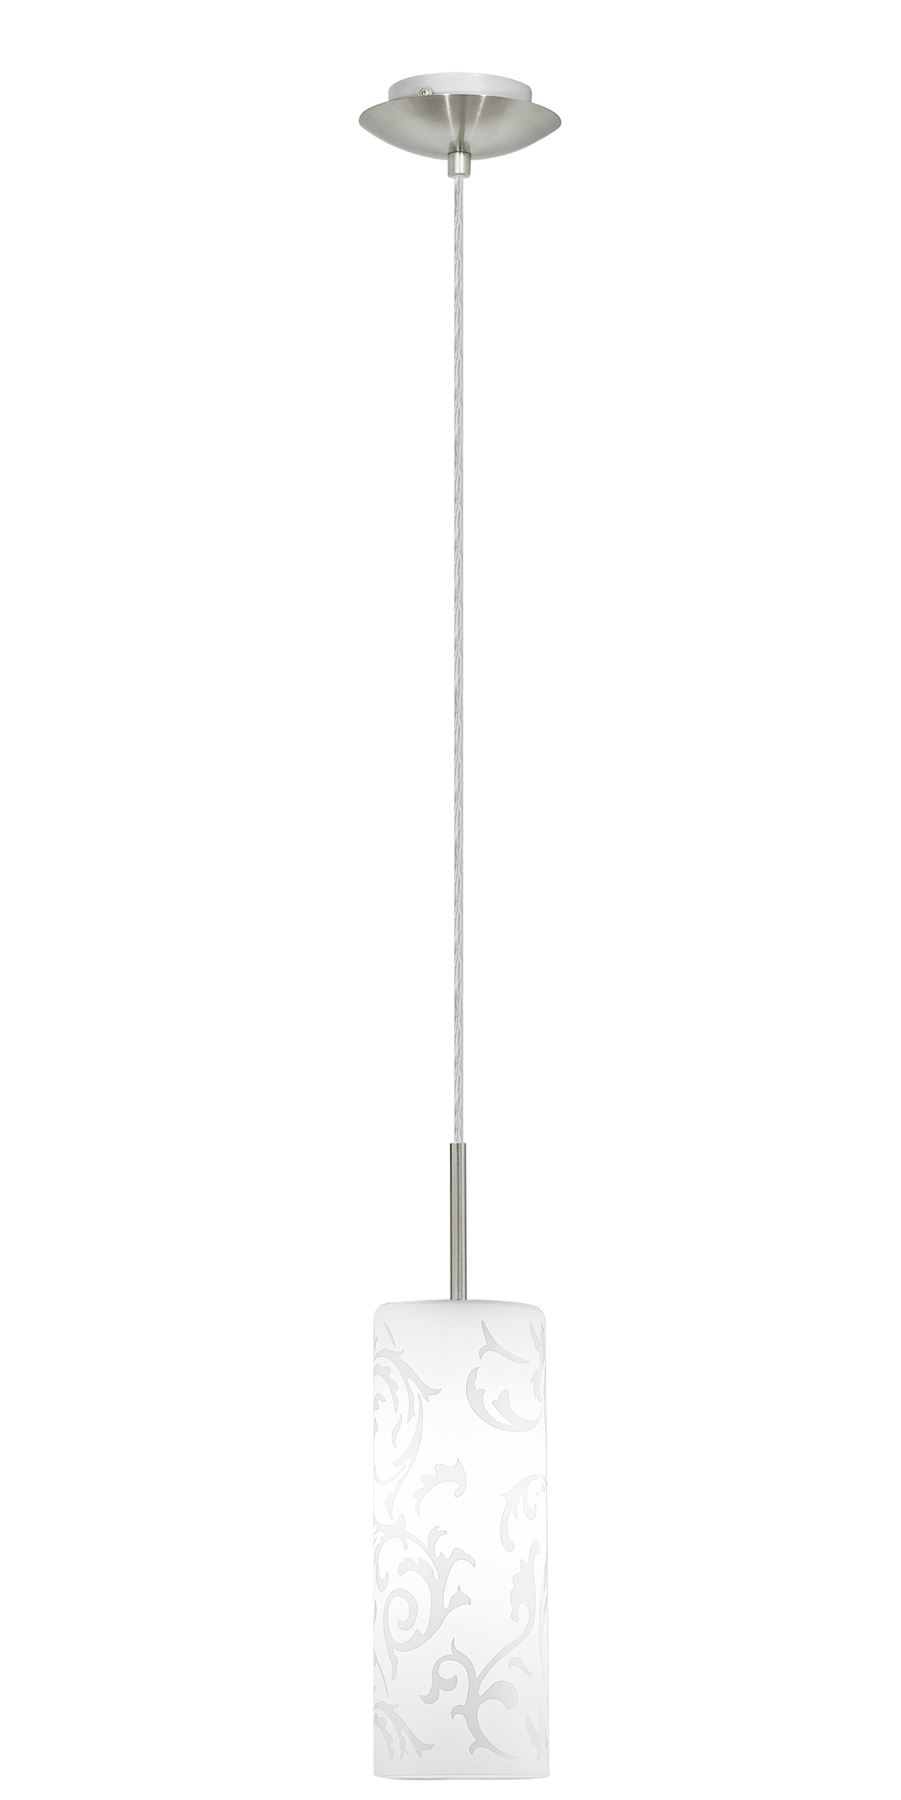 Amadora Hanging 1 Light Pendant Steel Nickel Matt White Printed Glass Shade